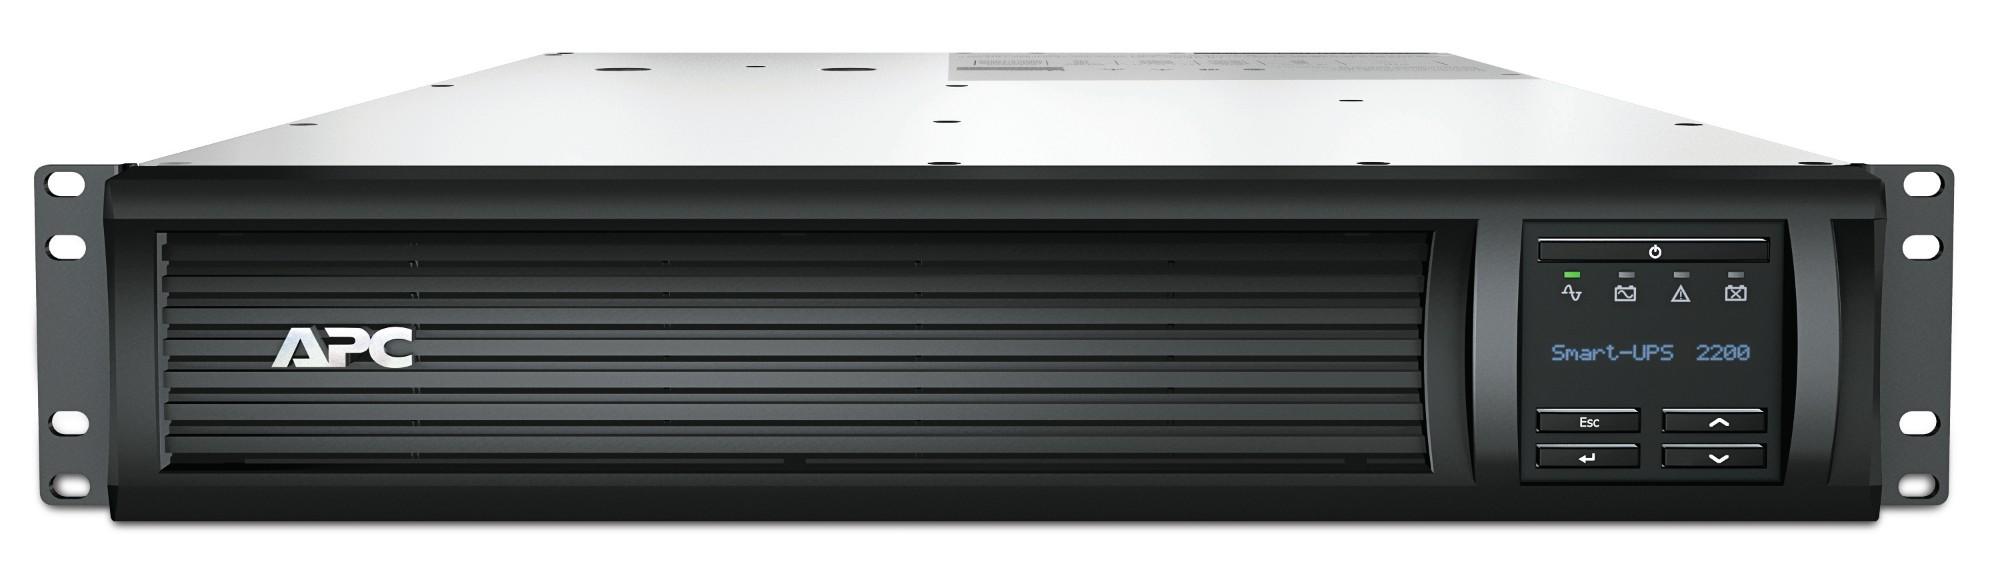 APC Smart-UPS 2200VA LCD RM 2U 230V with SmartConnect sistema de alimentación ininterrumpida (UPS) Línea interactiva 1980 W 9 salidas AC